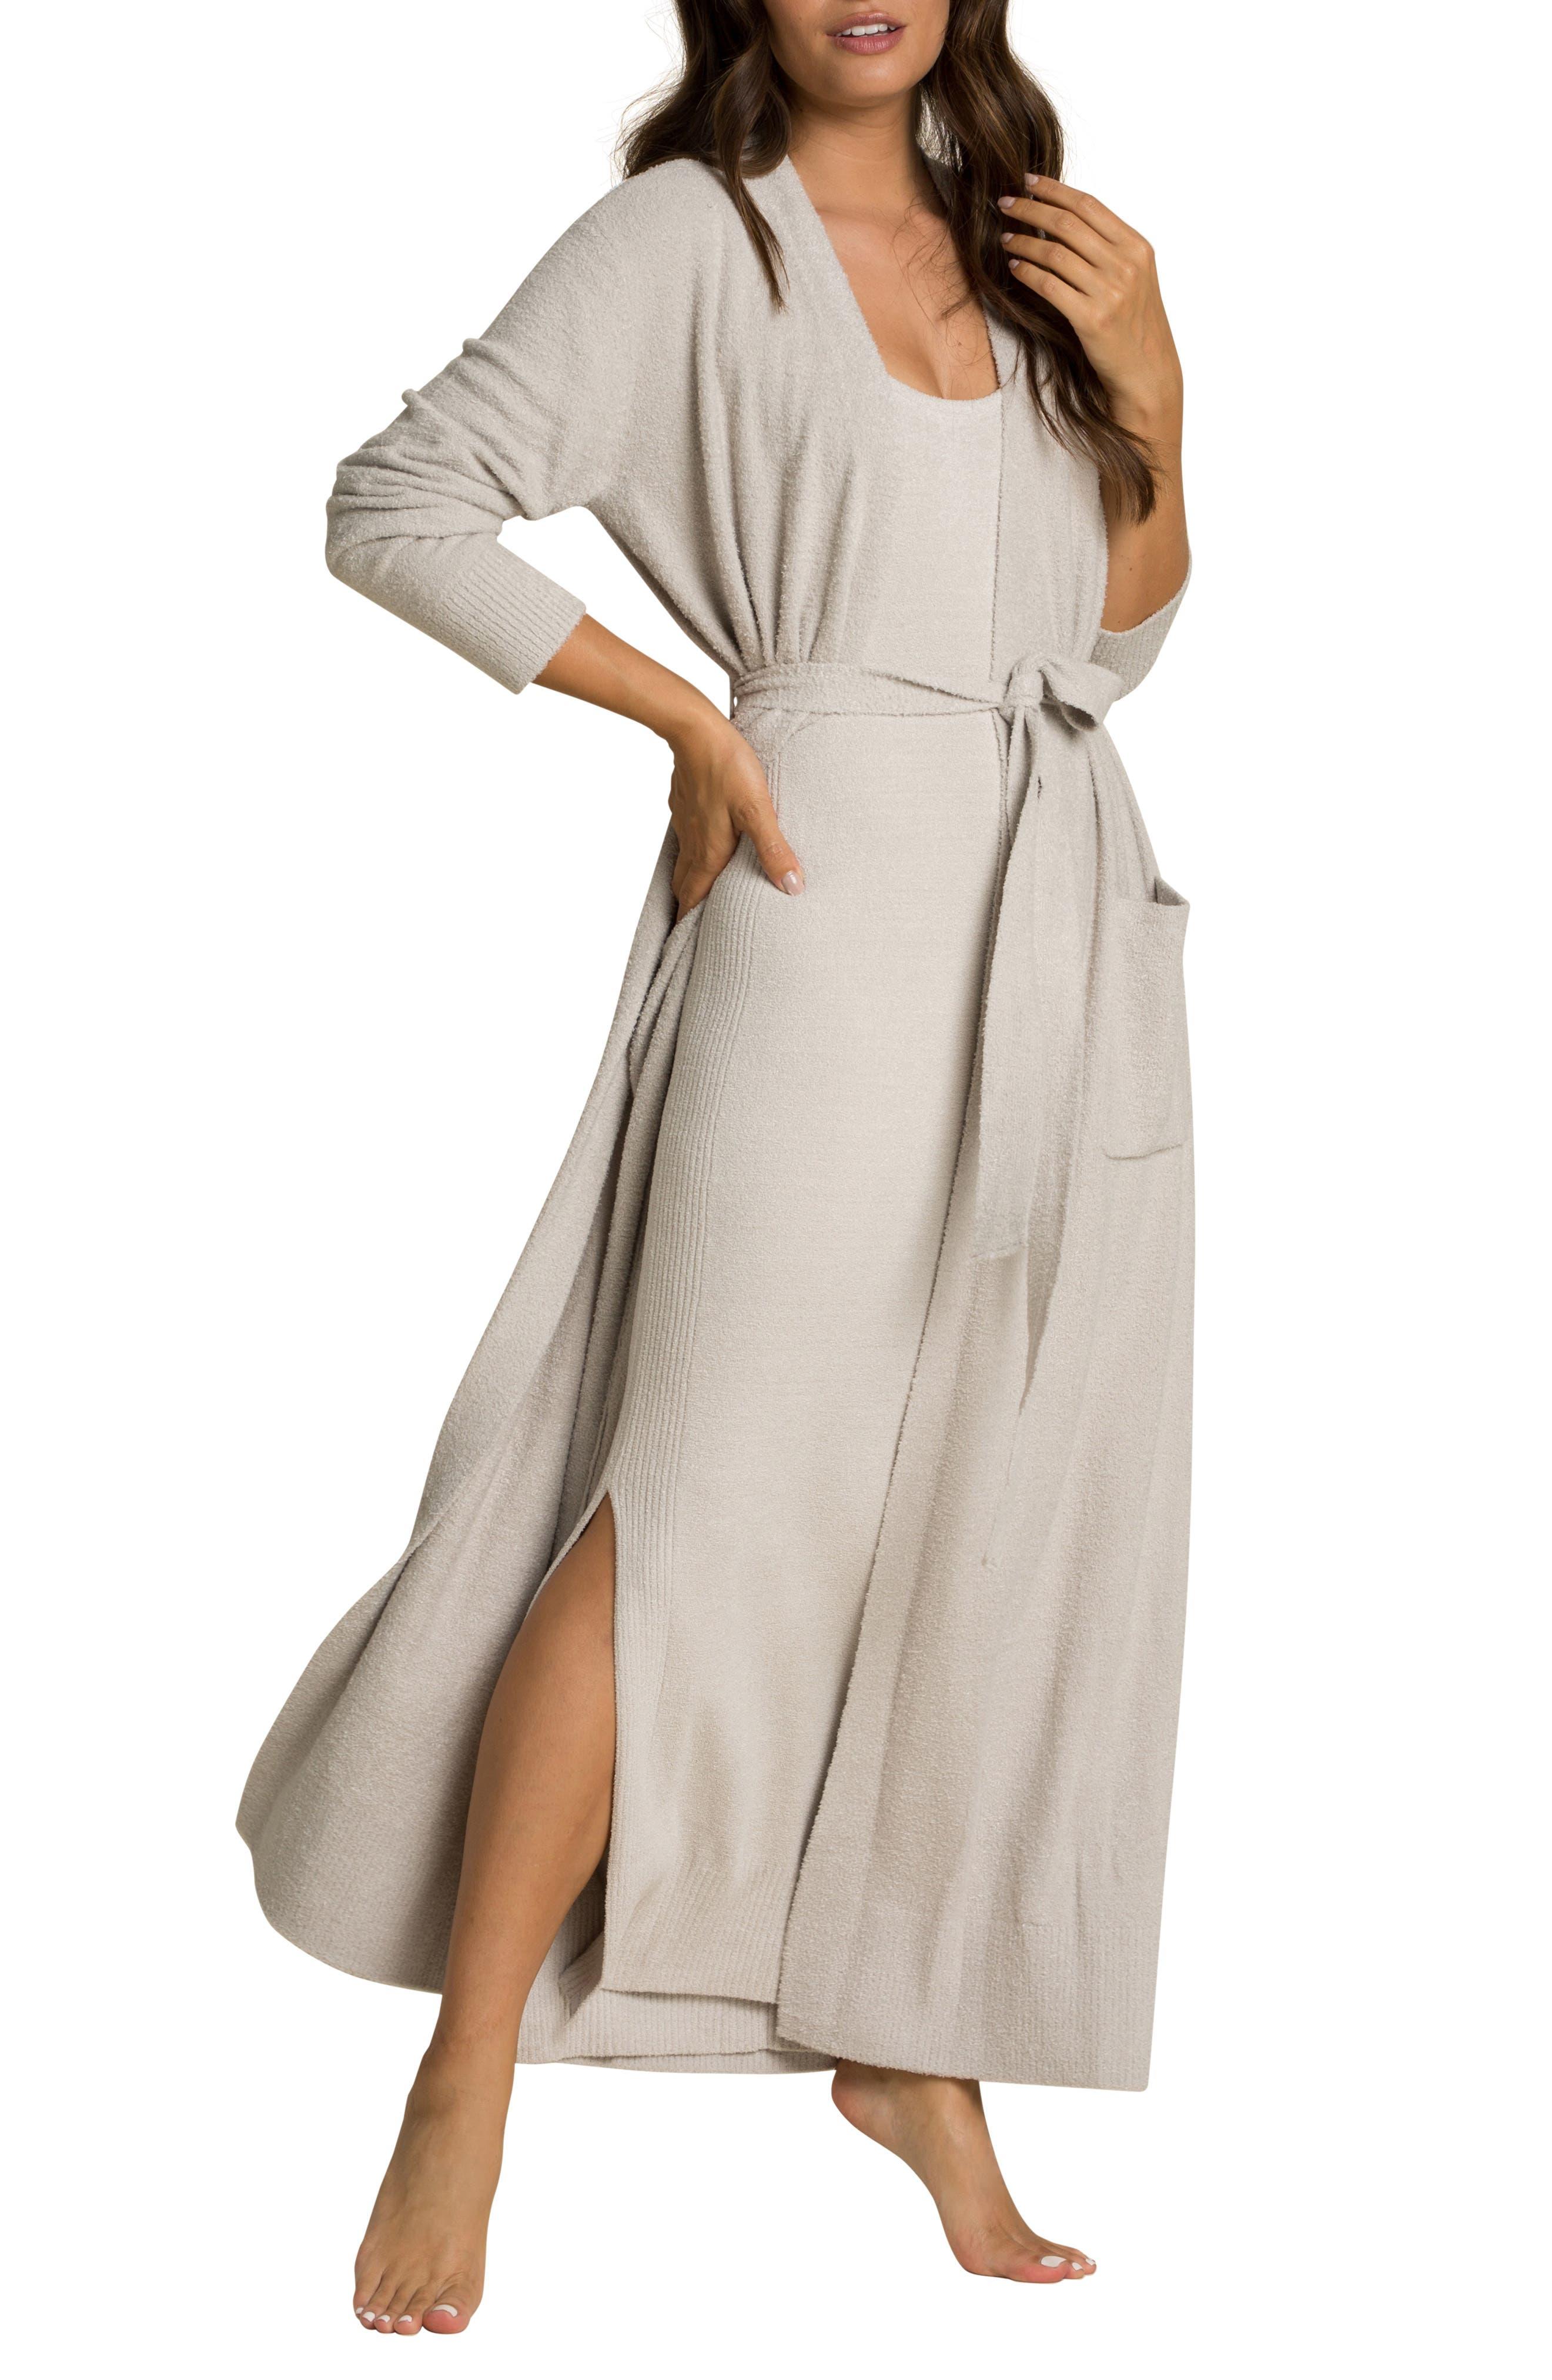 Barefoot Dreams(R) CozyChic Ultra Lite(TM) Long Robe